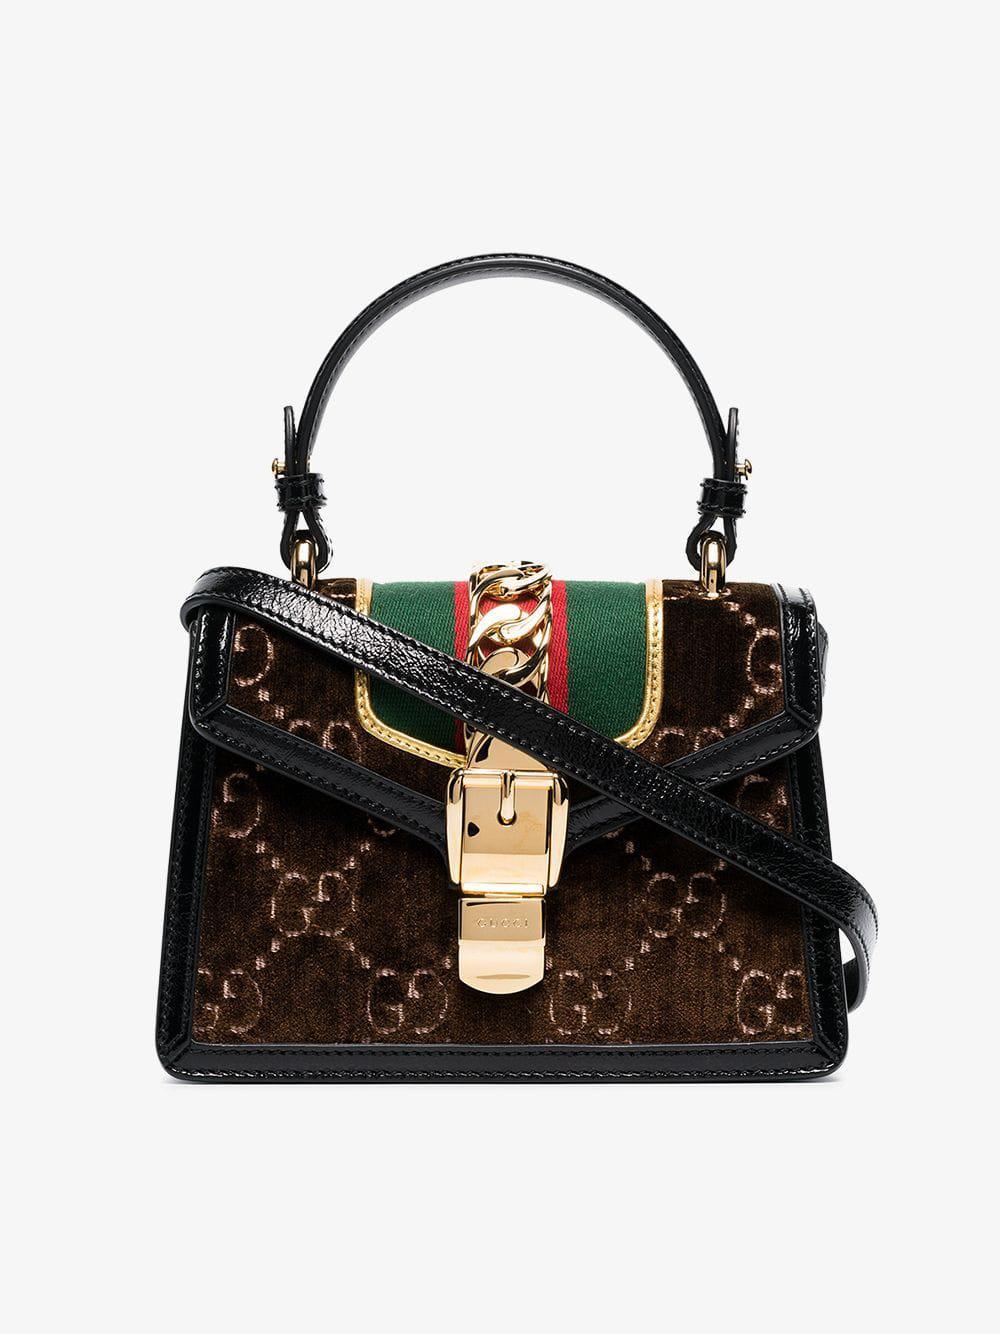 5c7611d243d7a7 Gucci Brown Sylvie GG Velvet Mini Bag in Brown - Lyst